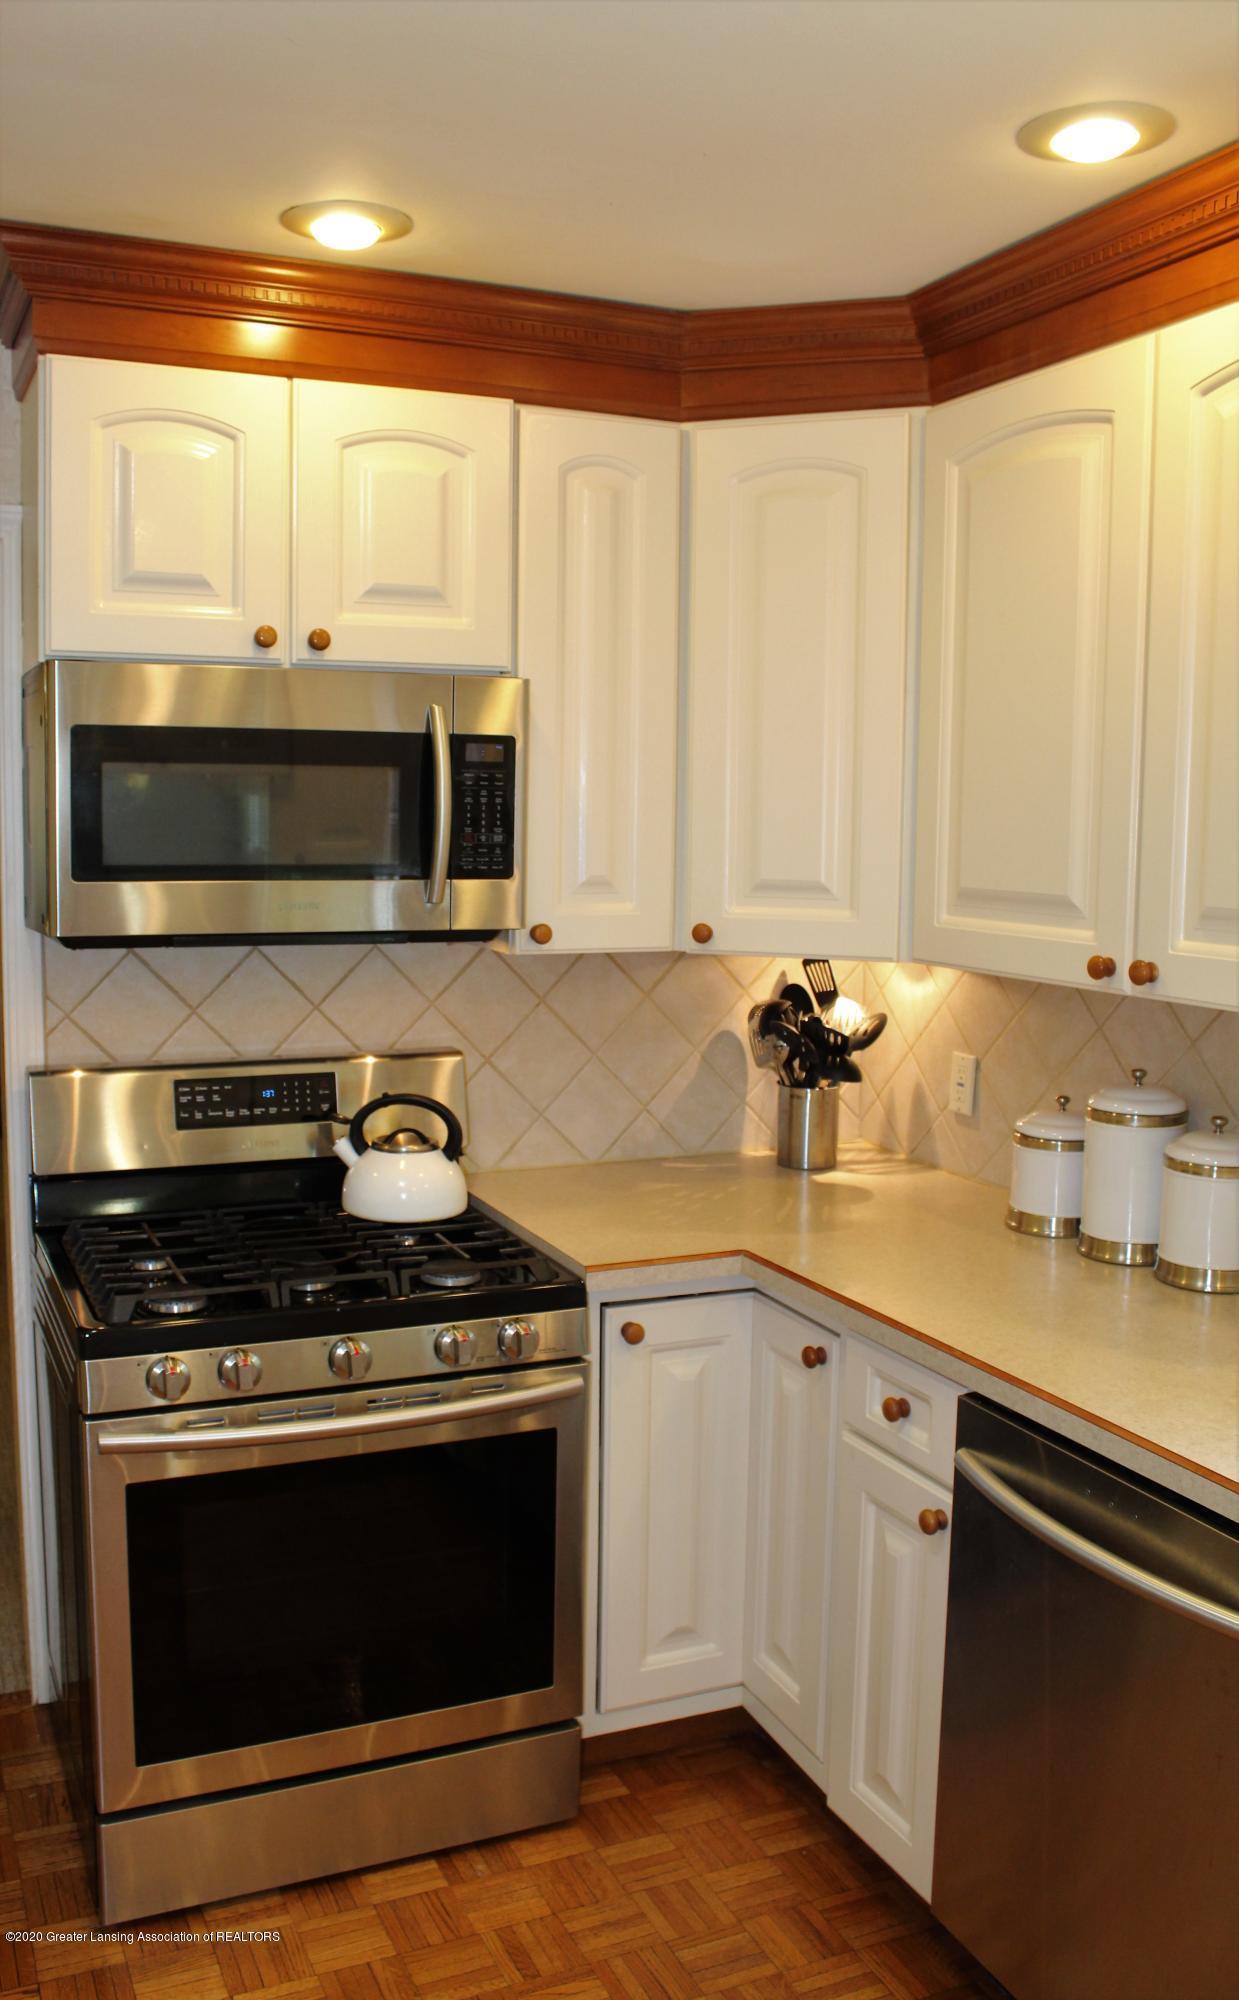 3599 W Arbutus Dr - Kitchen - 19